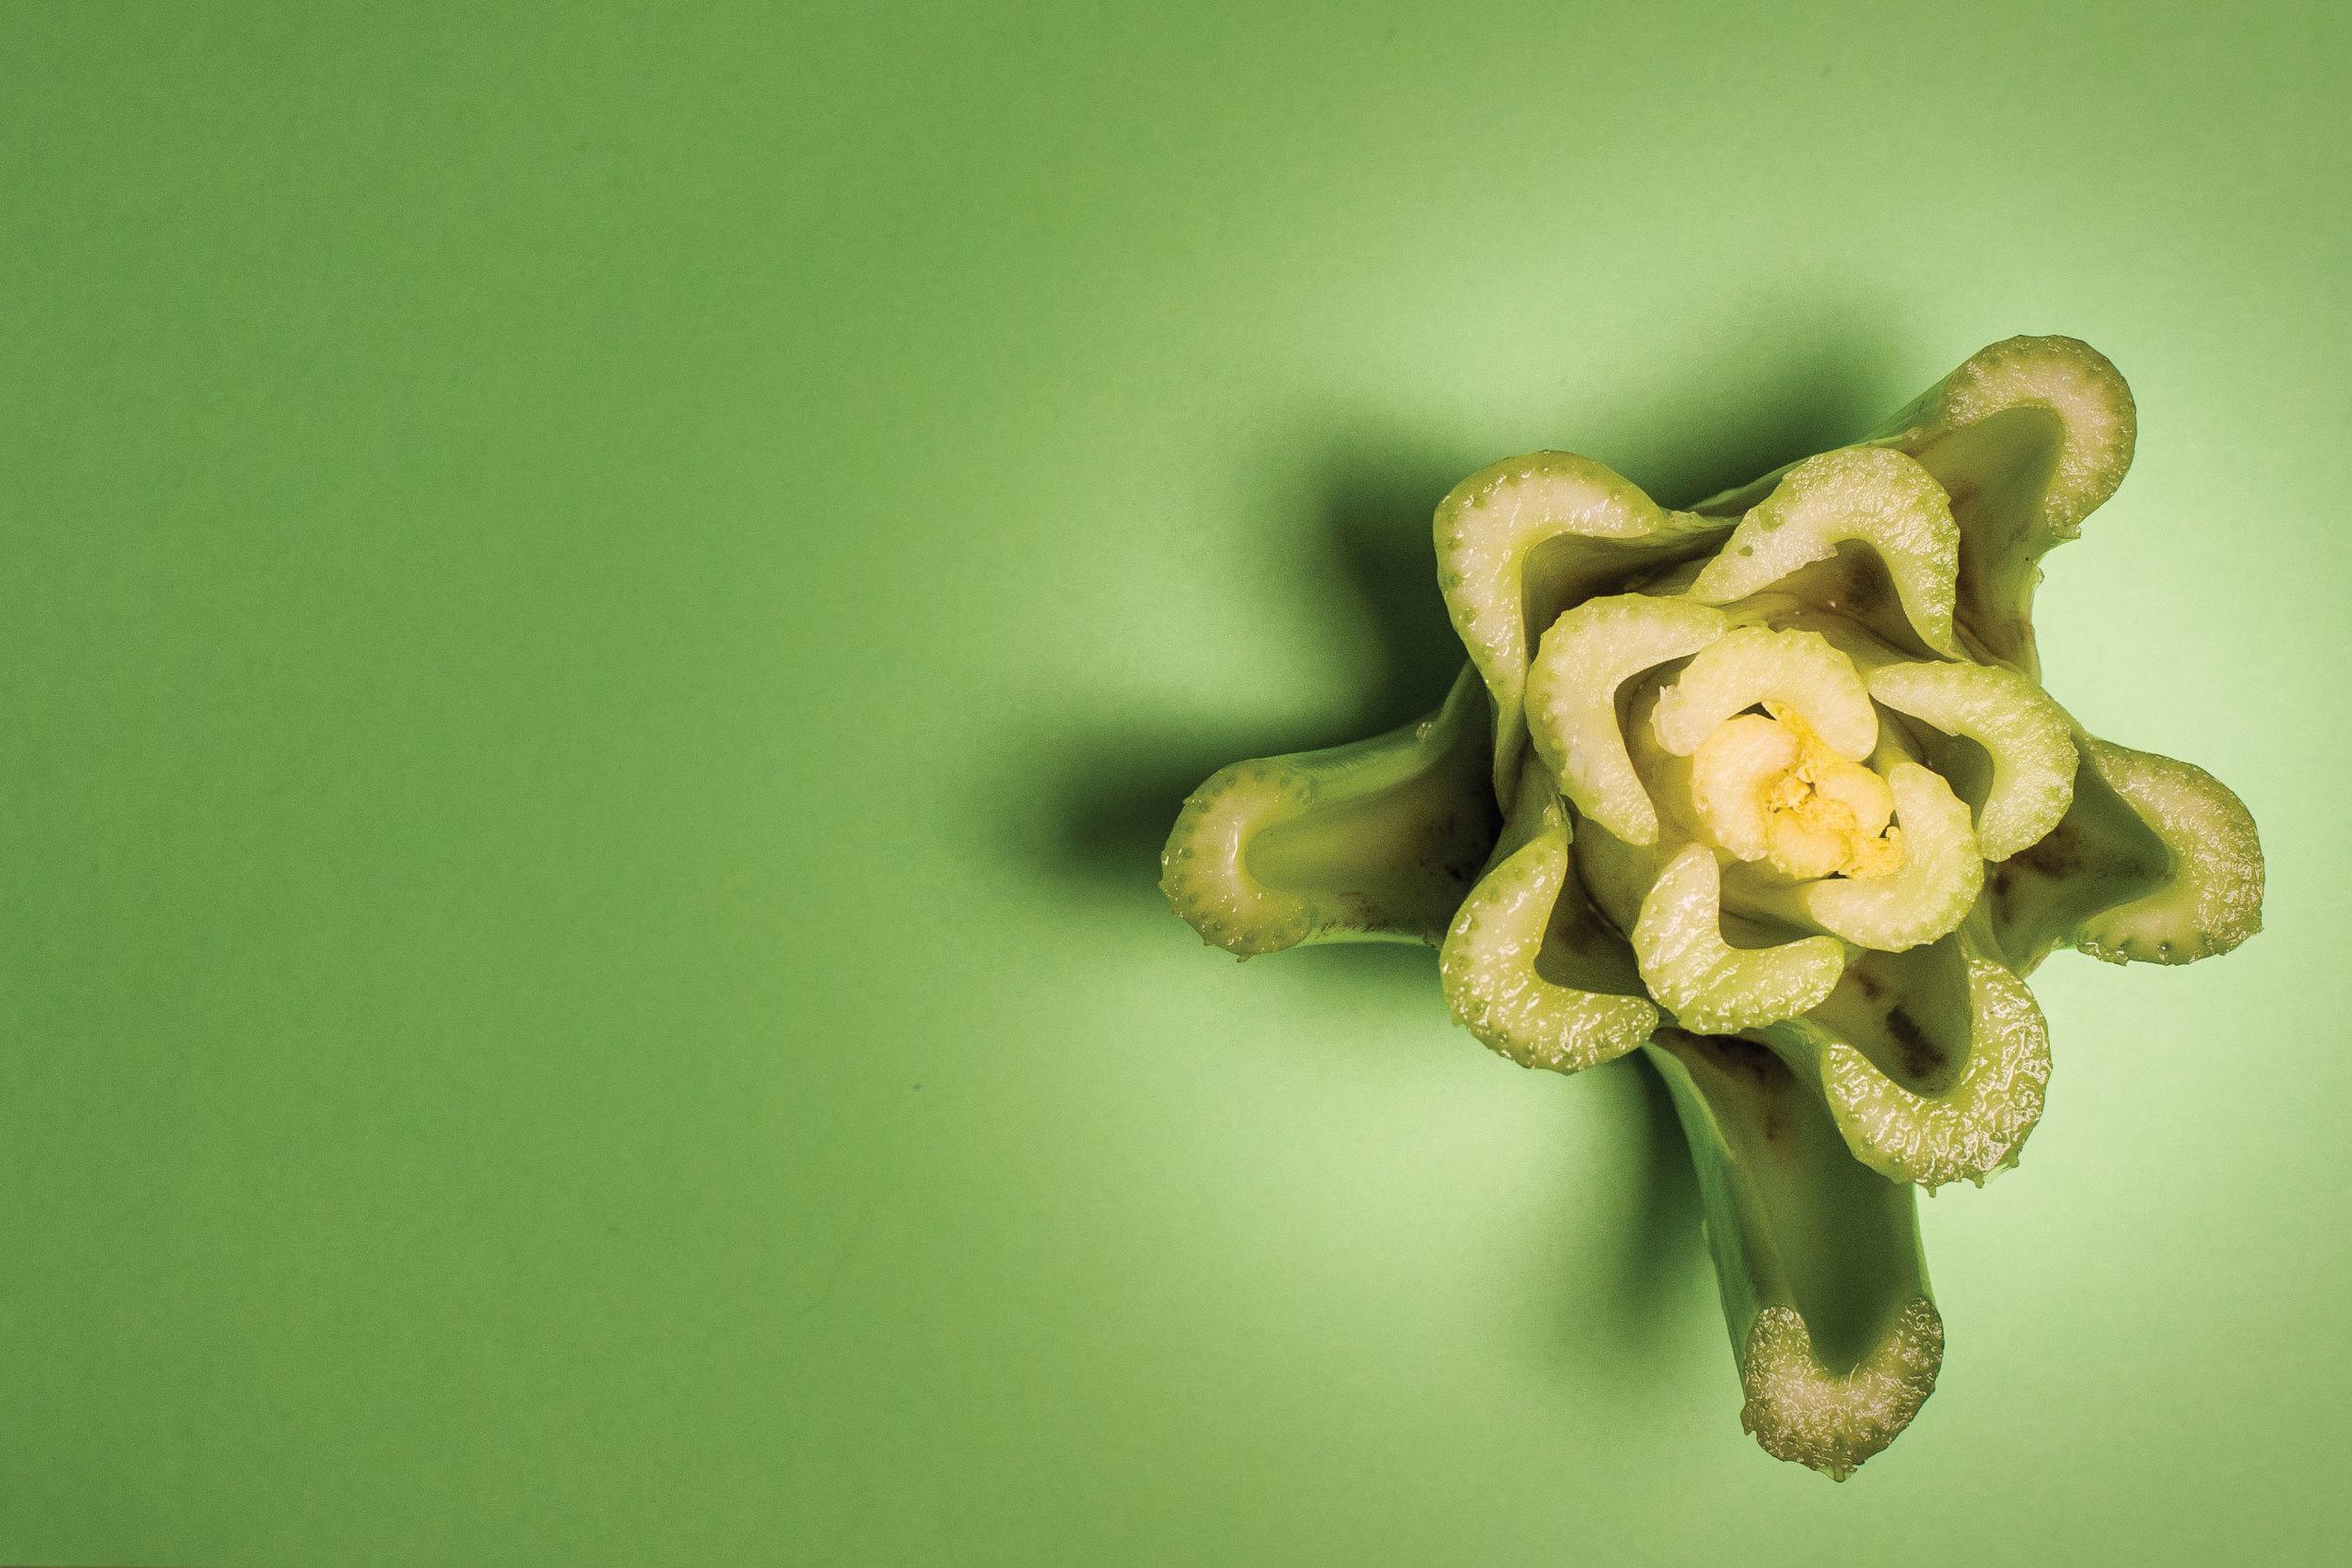 Celery green by Sam Henderson of Today's Nest